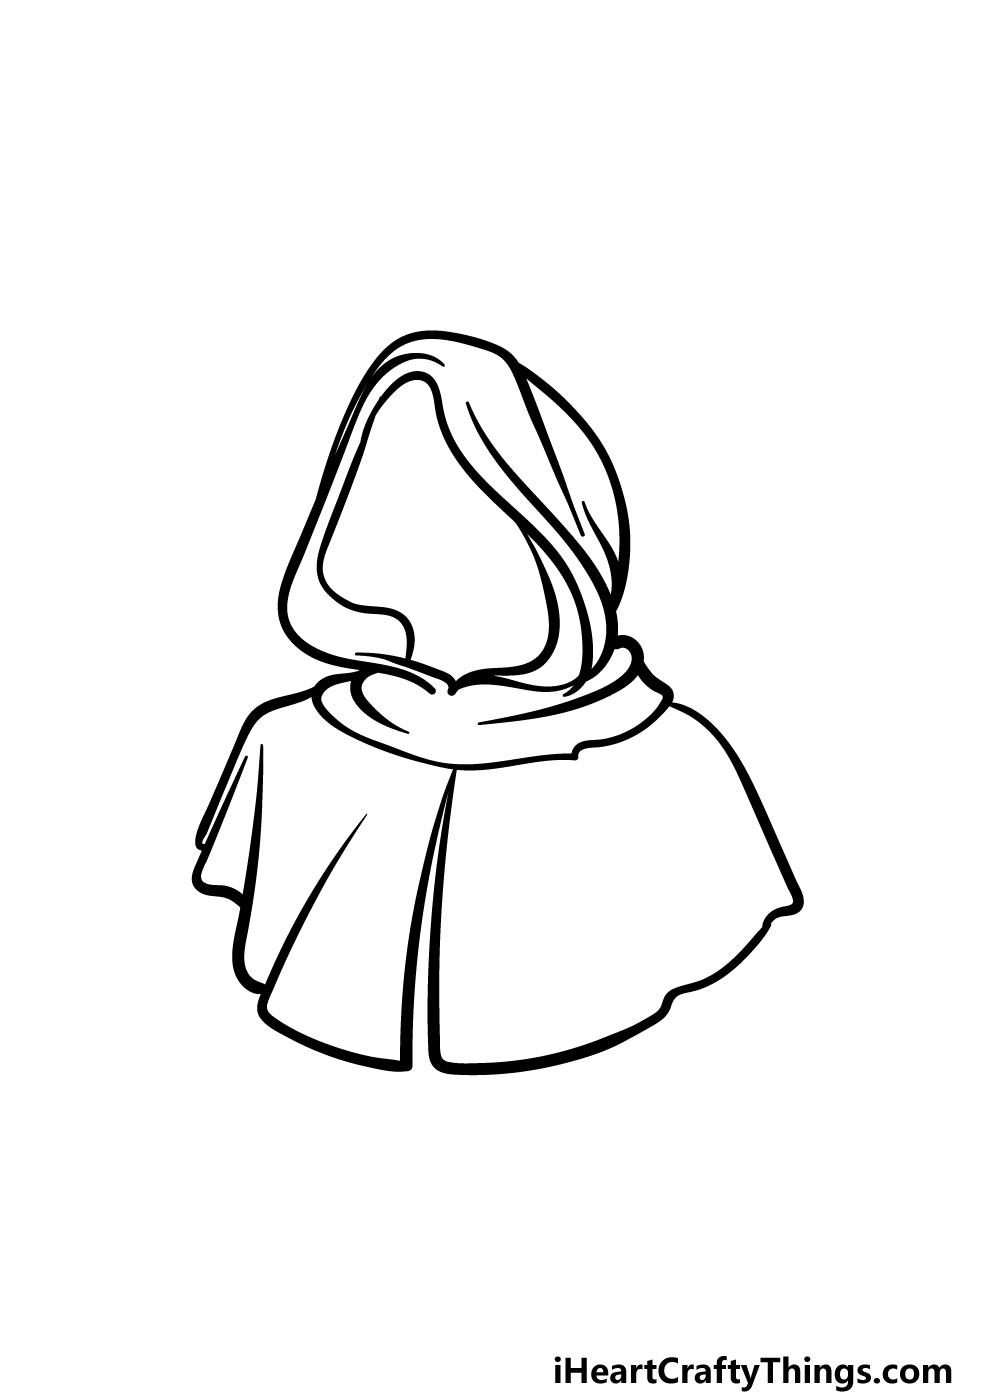 drawing a hood step 4